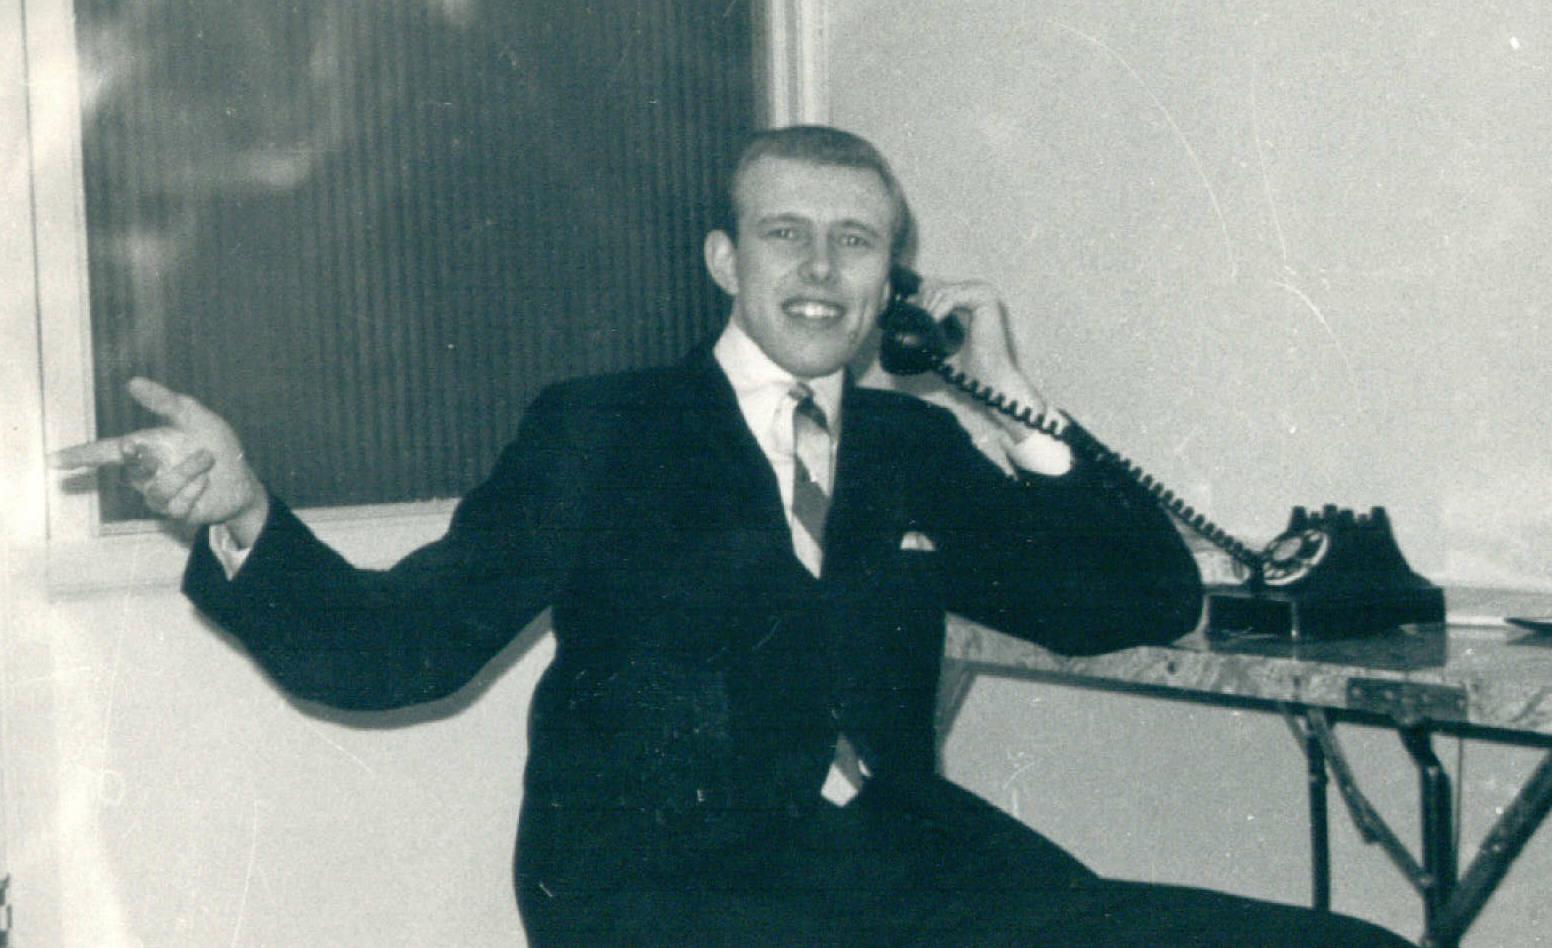 Lincoln Hills: Fifty Year Friend: Dennis Gougion